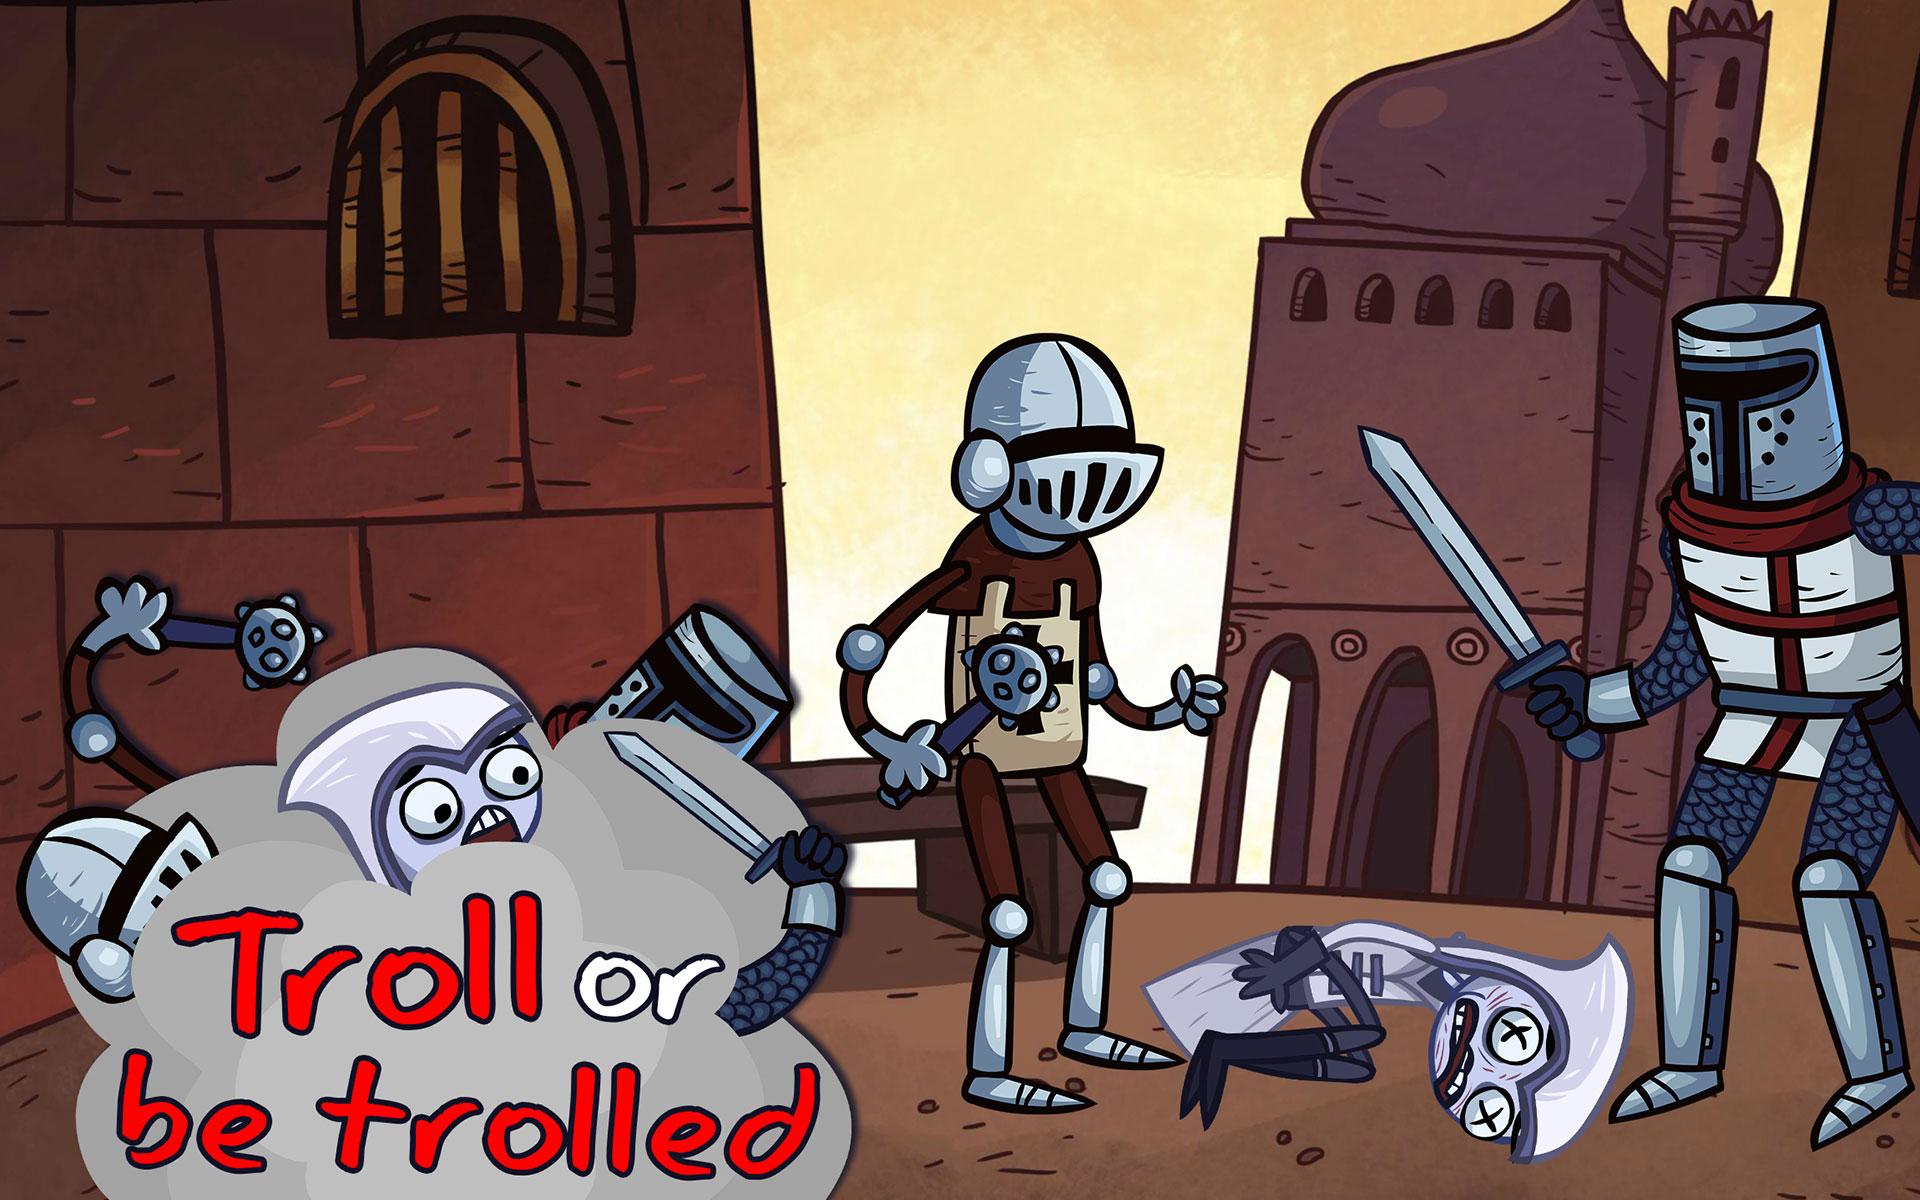 Troll Face Quest Video Games: Amazon com br: Amazon Appstore